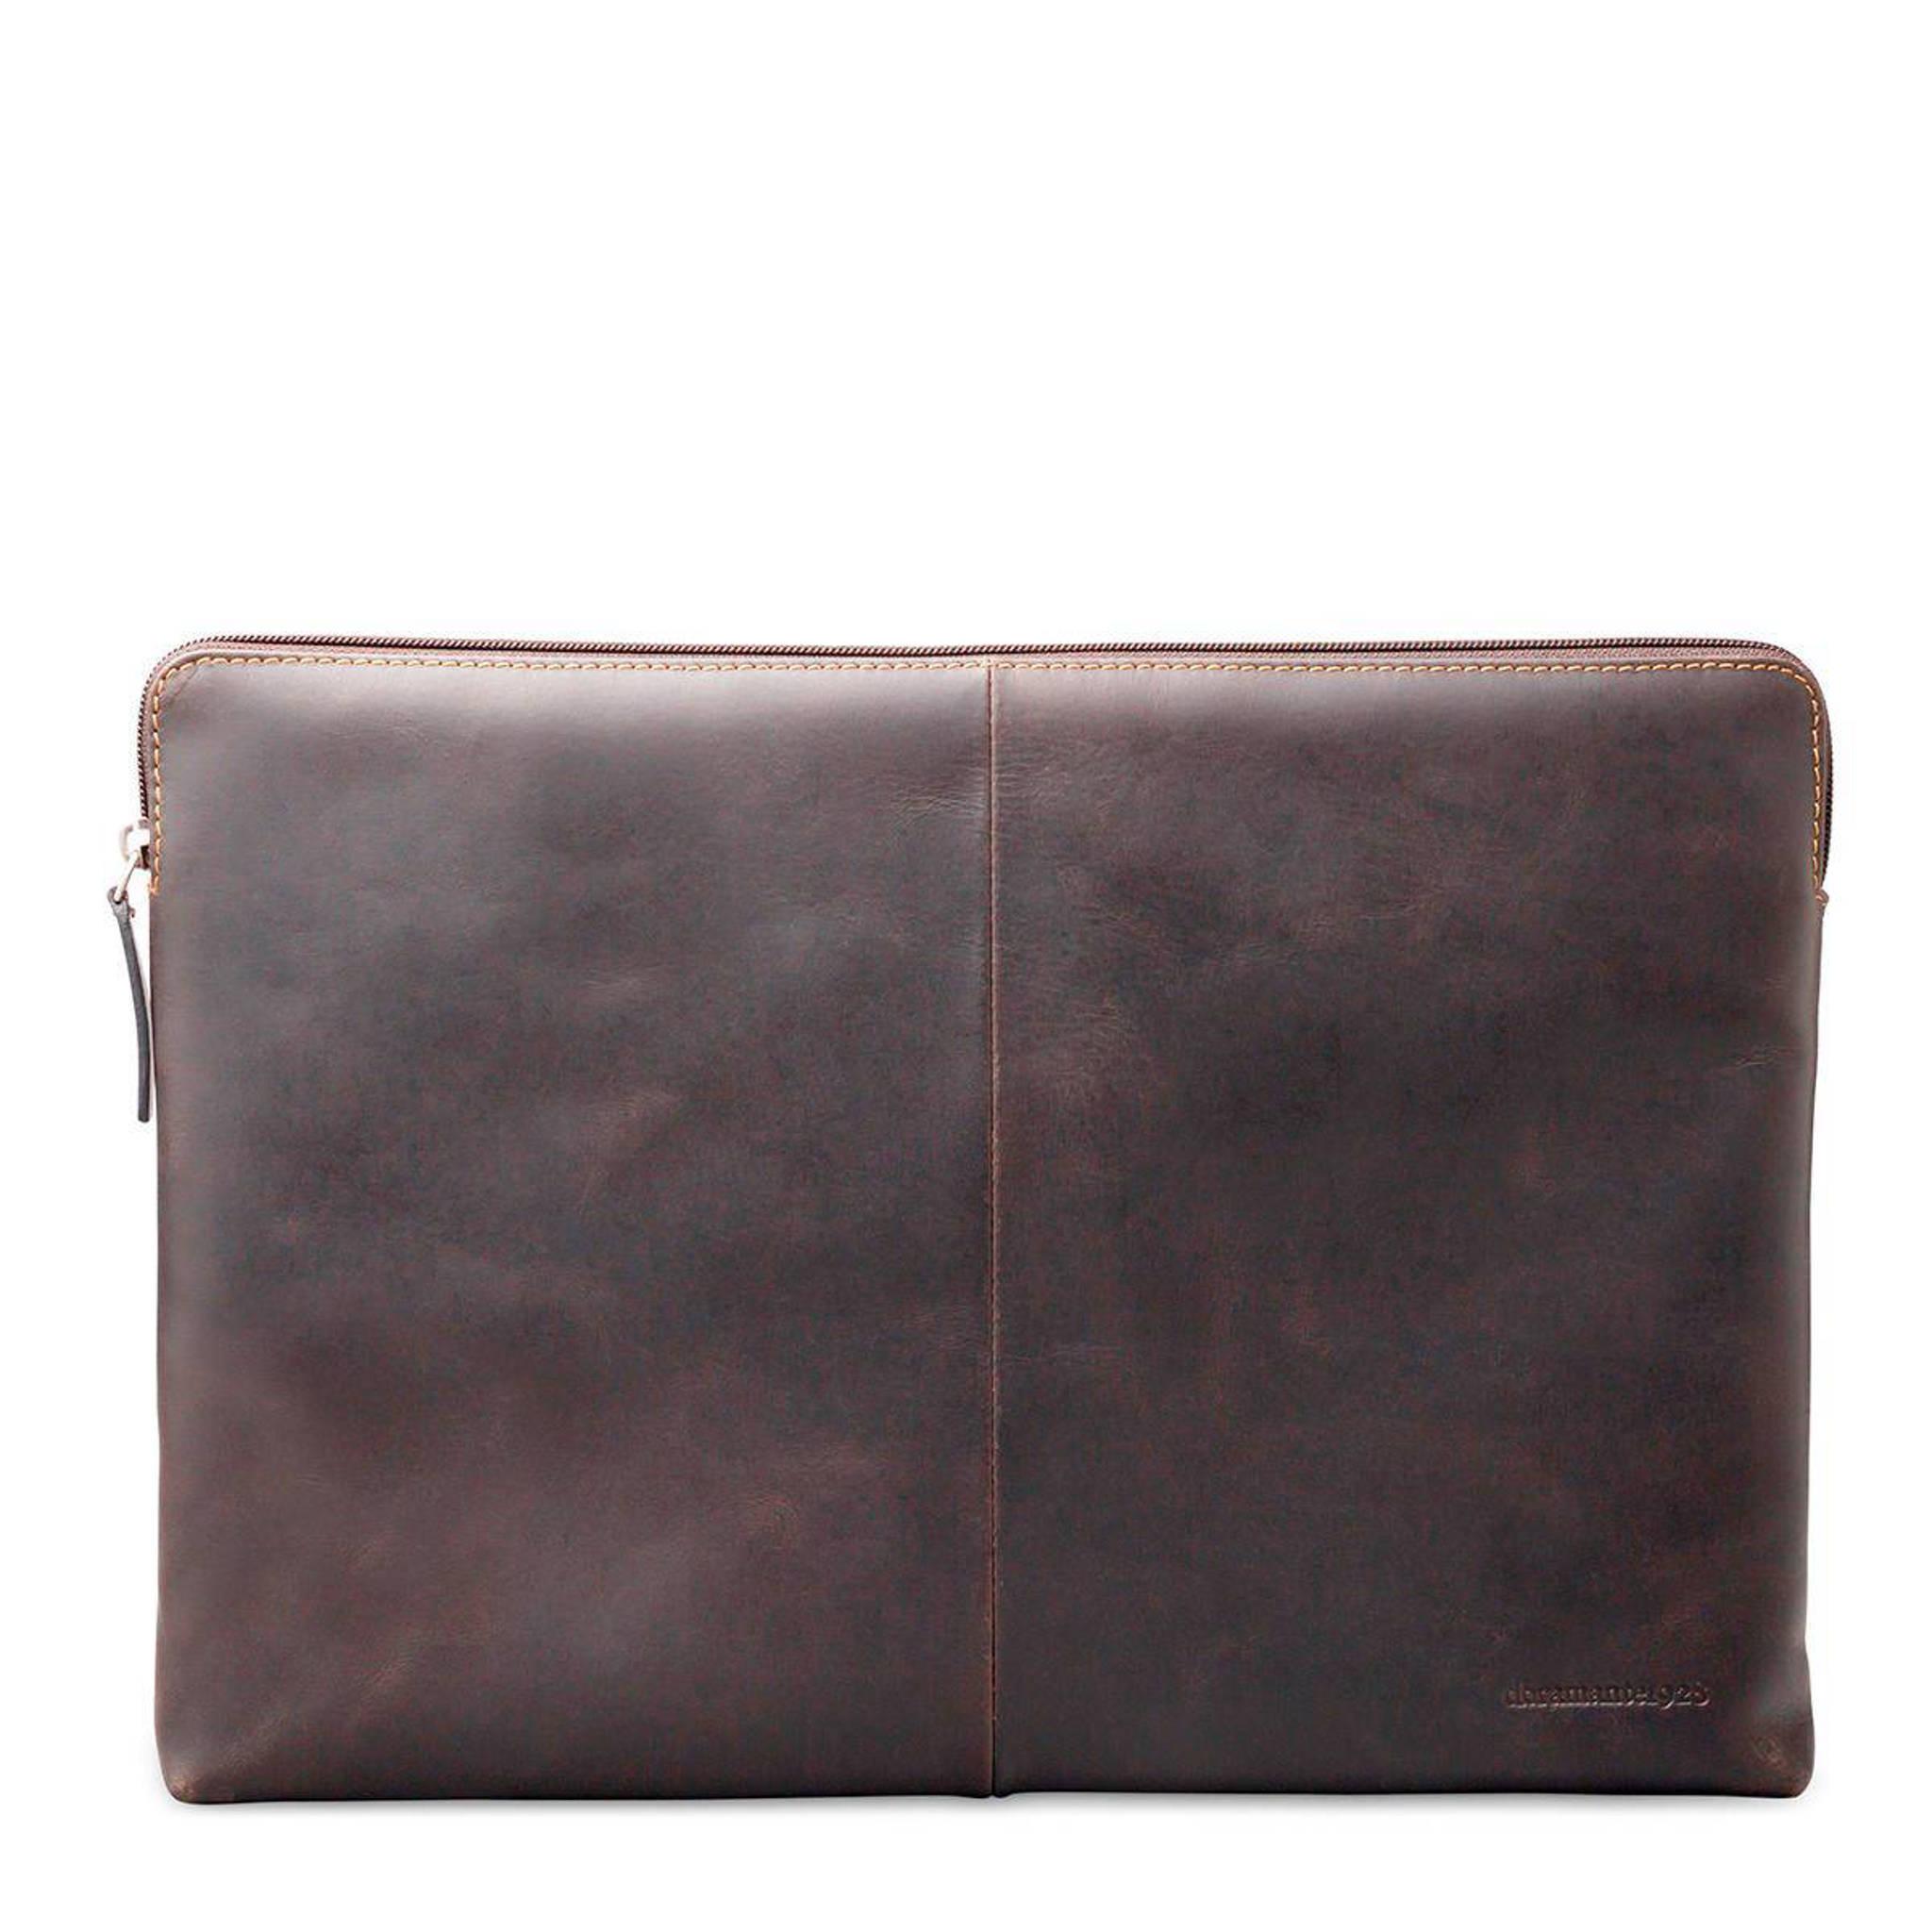 22ea79116ee dbramante1928 Skagen 13,3 inch laptopsleeve   wehkamp